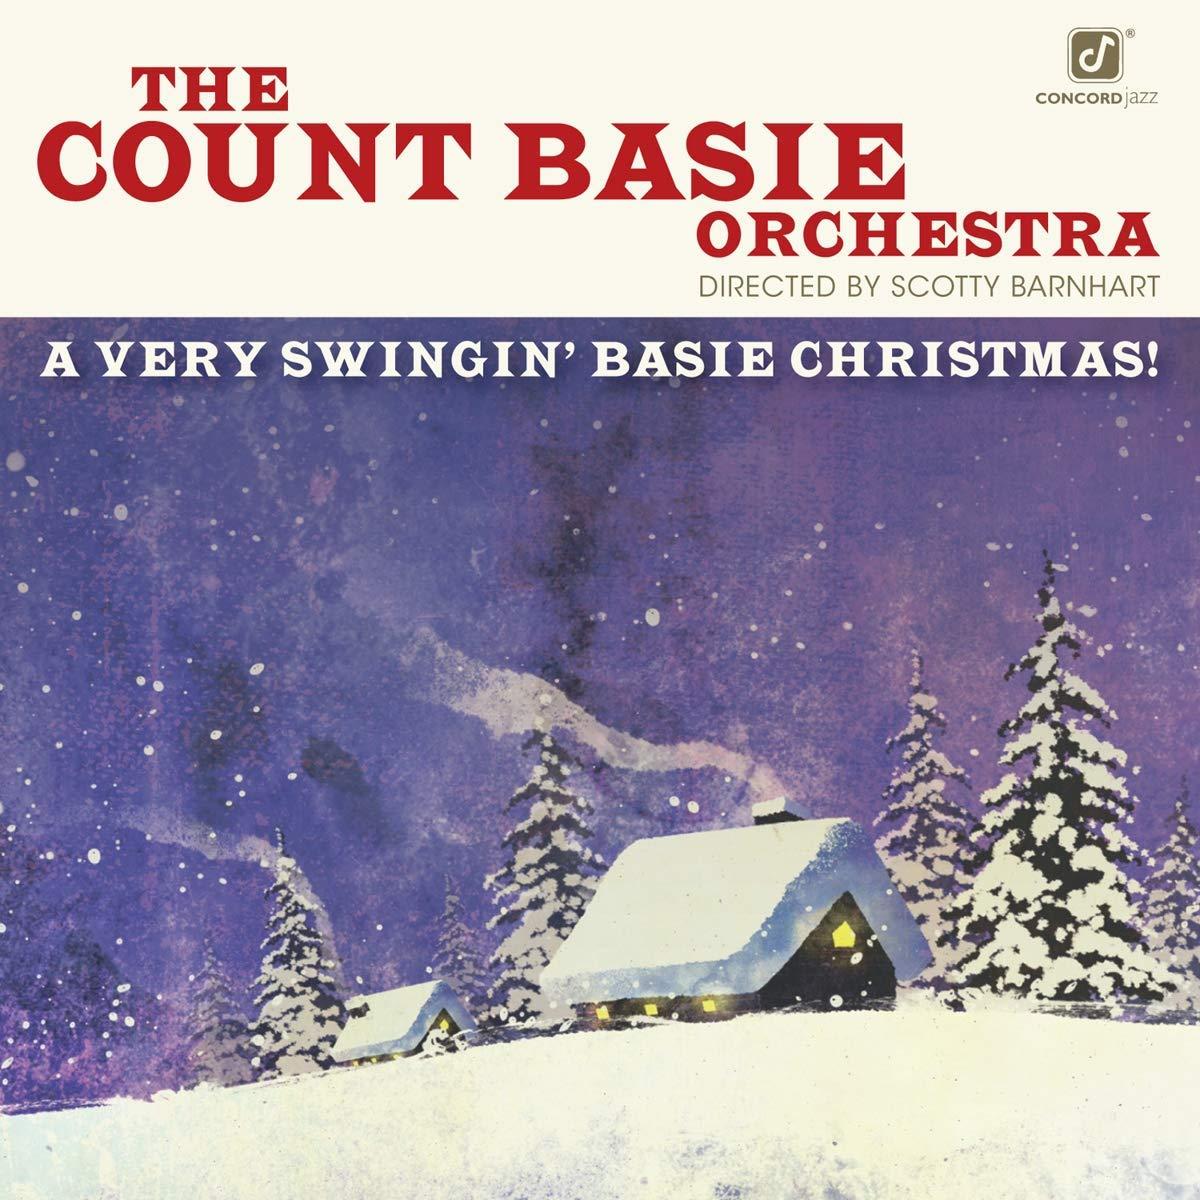 A Very Swingin' Basie Christmas! [LP]